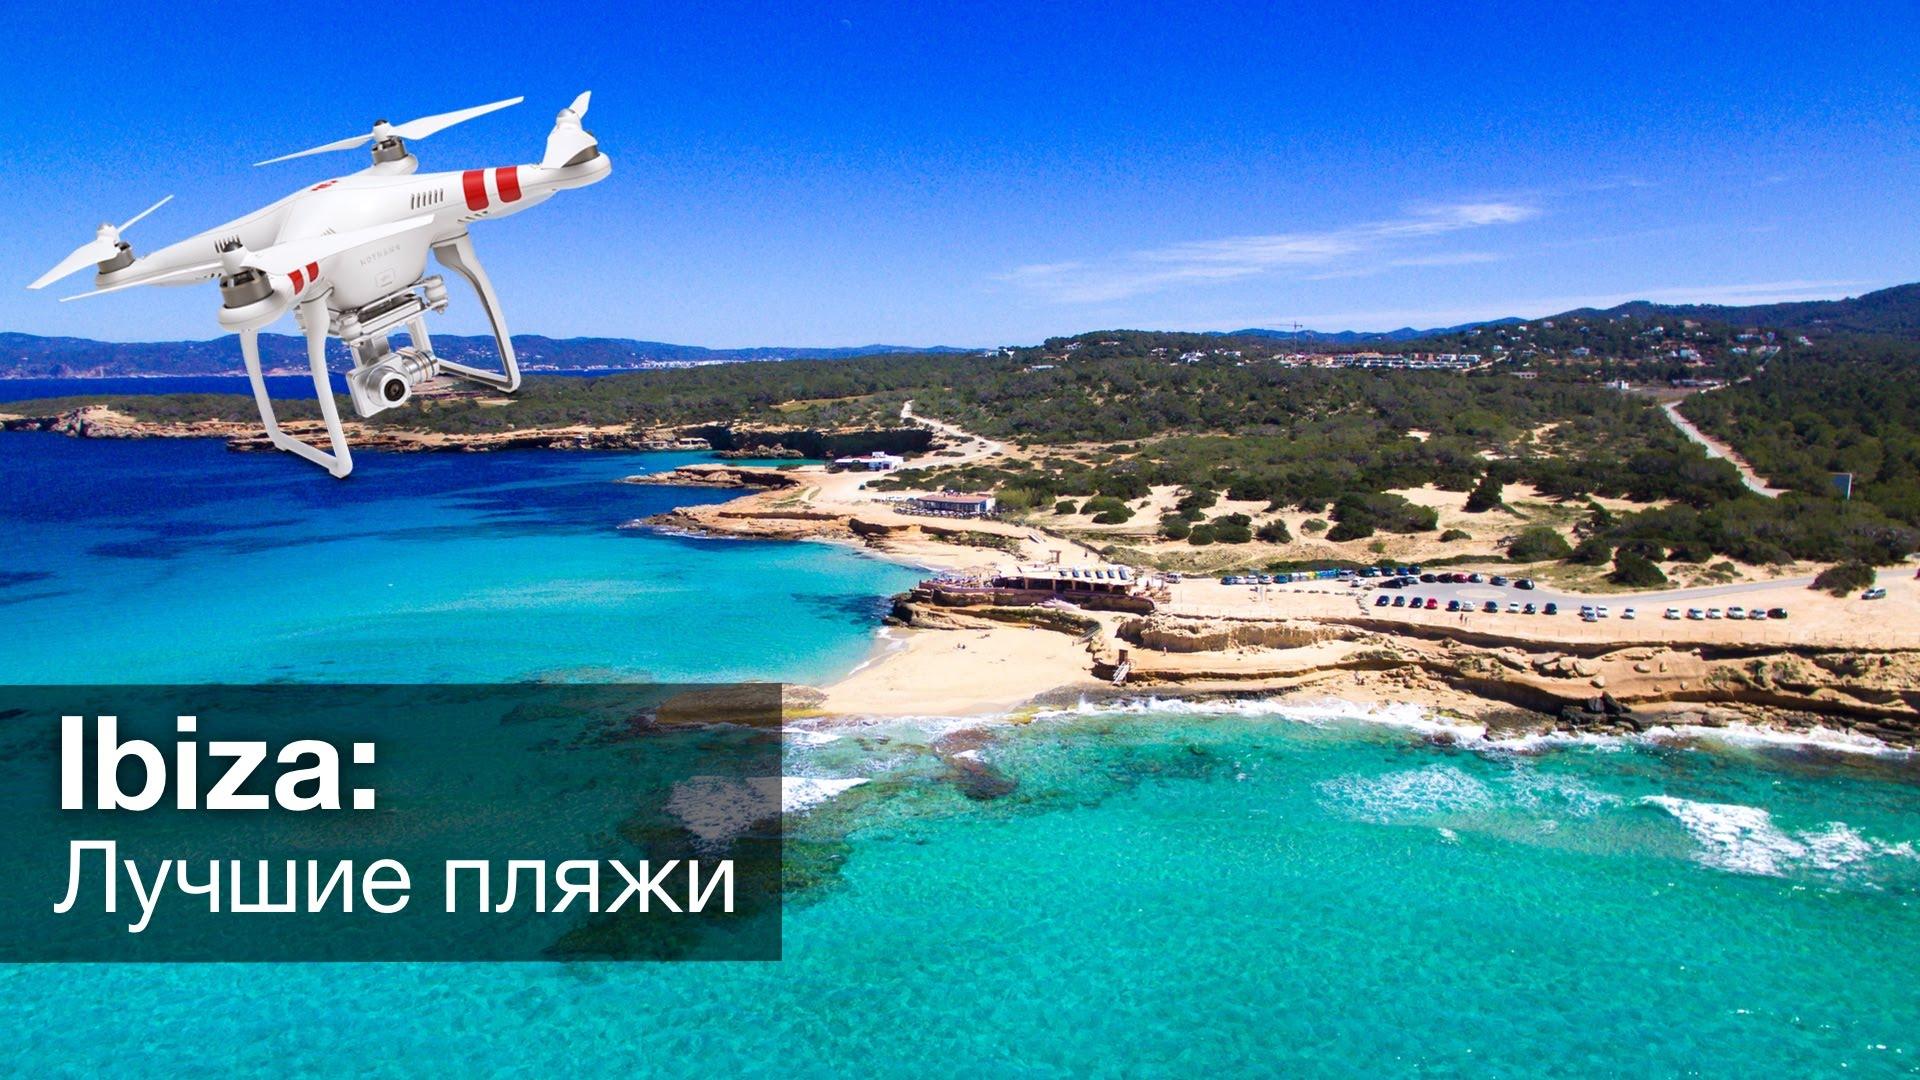 Ibiza Karte Strande.Karte Der Strande Von Ibiza Solo Ibiza